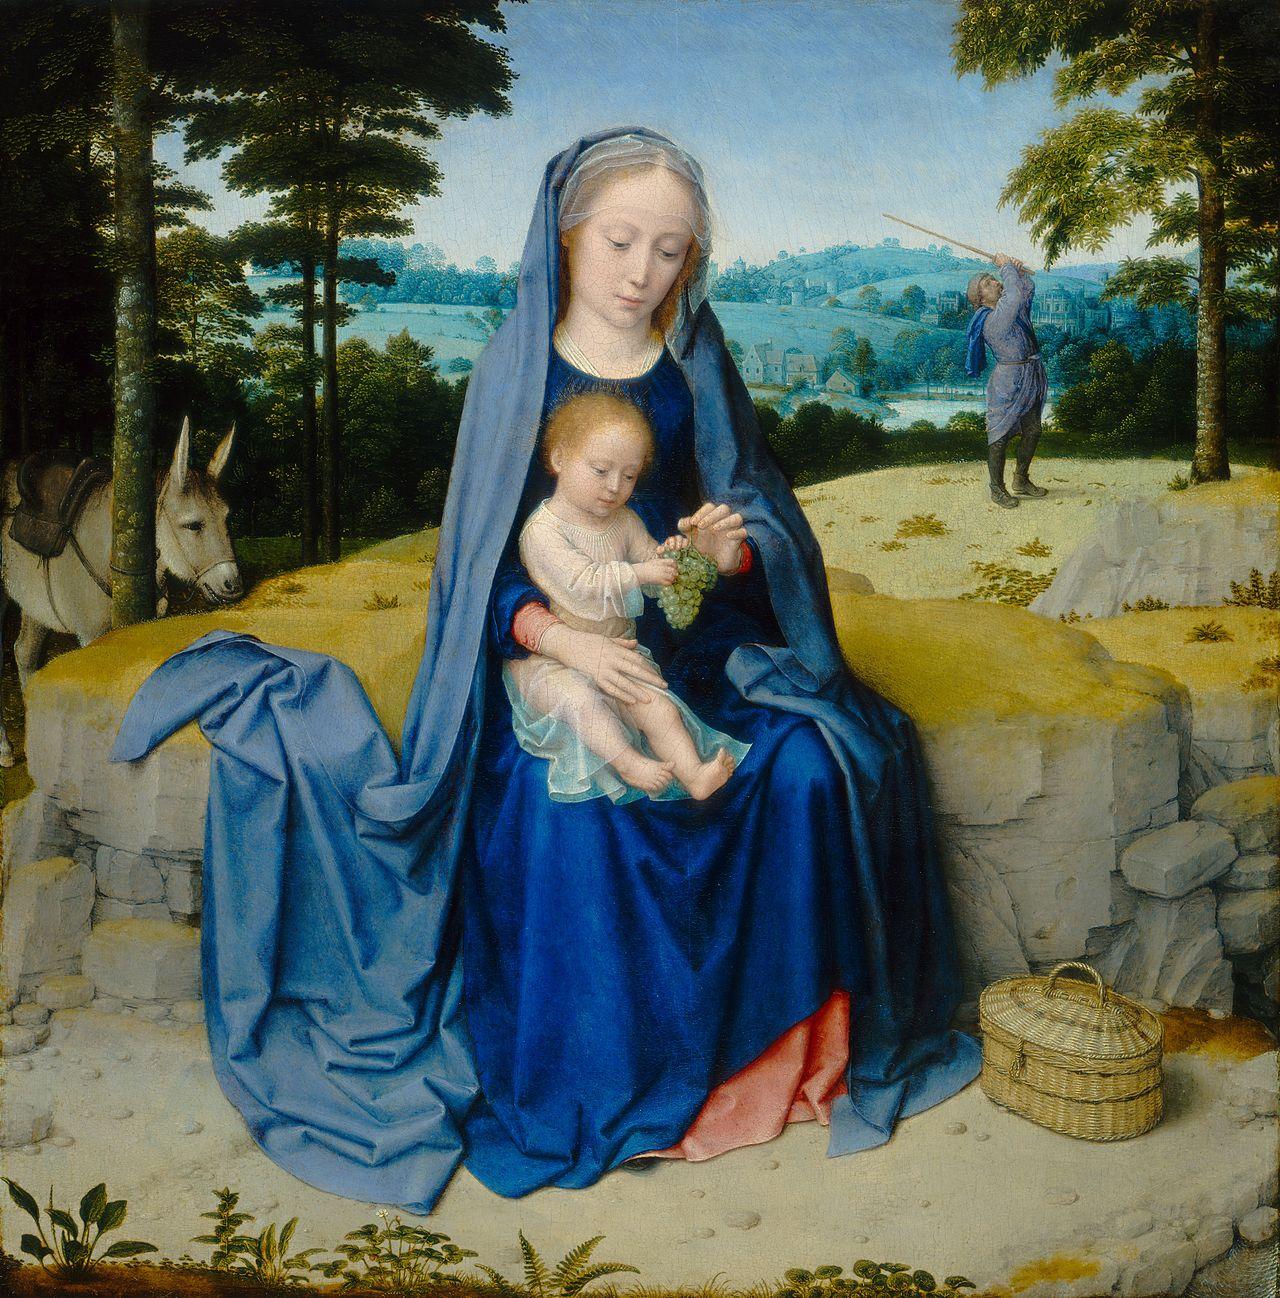 A Gaelic Christmas Carol: Leanabh an Àigh